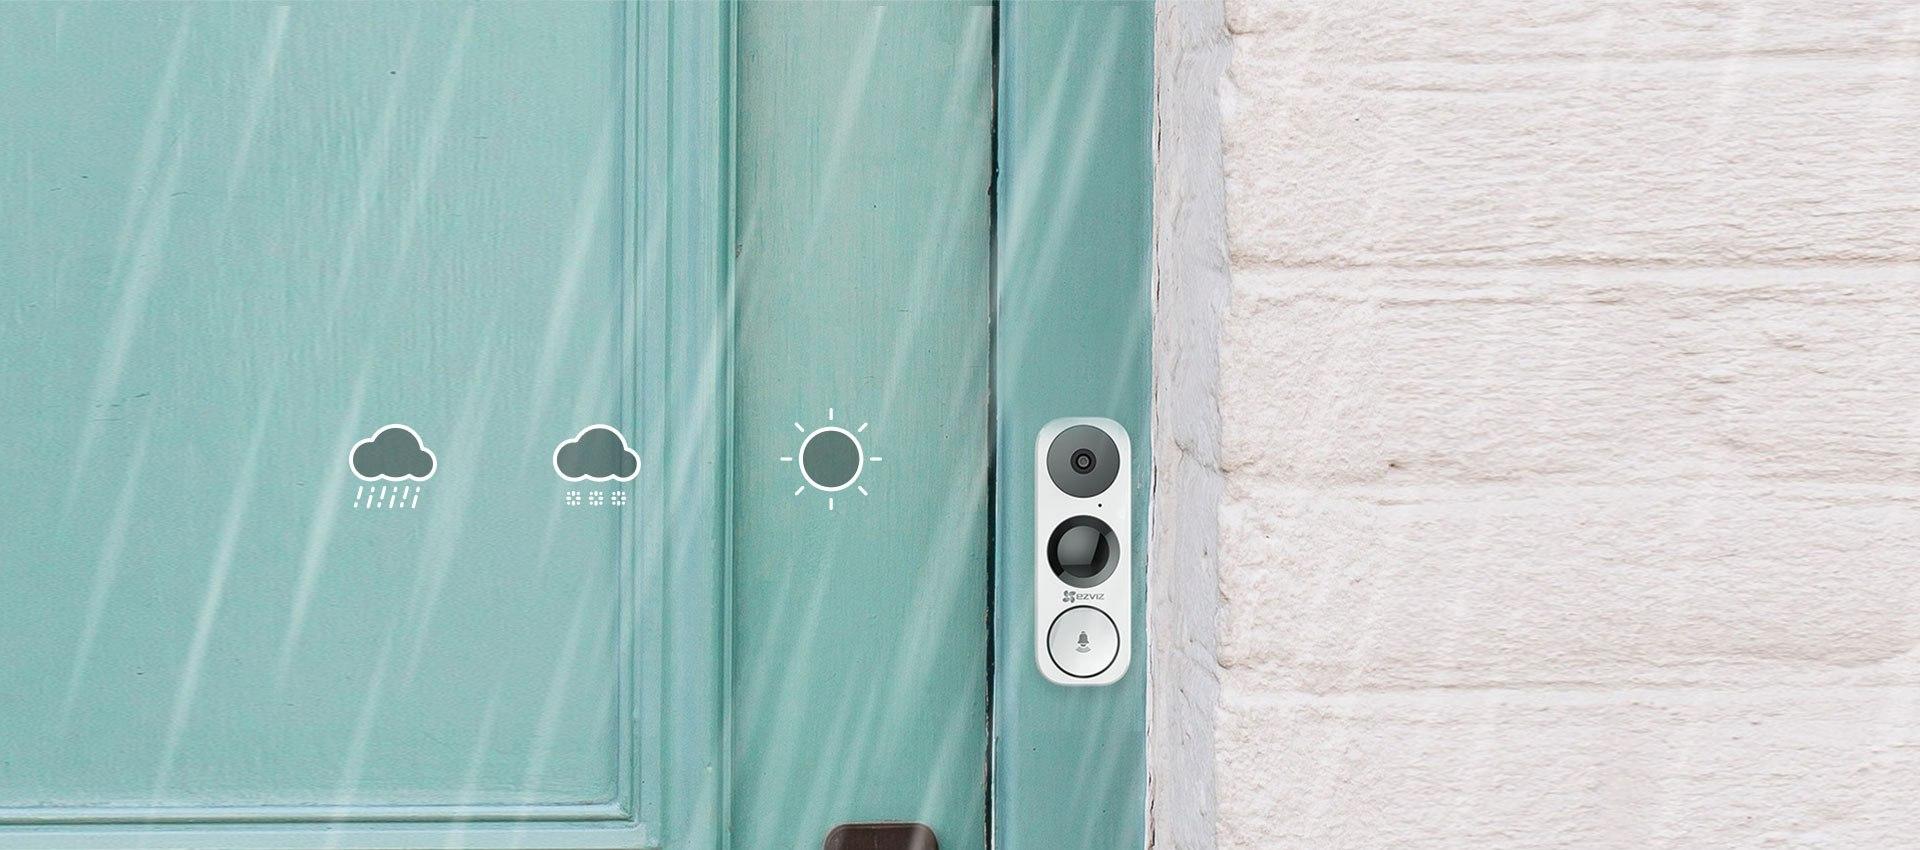 DB1 - EZVIZ Video Doorbell